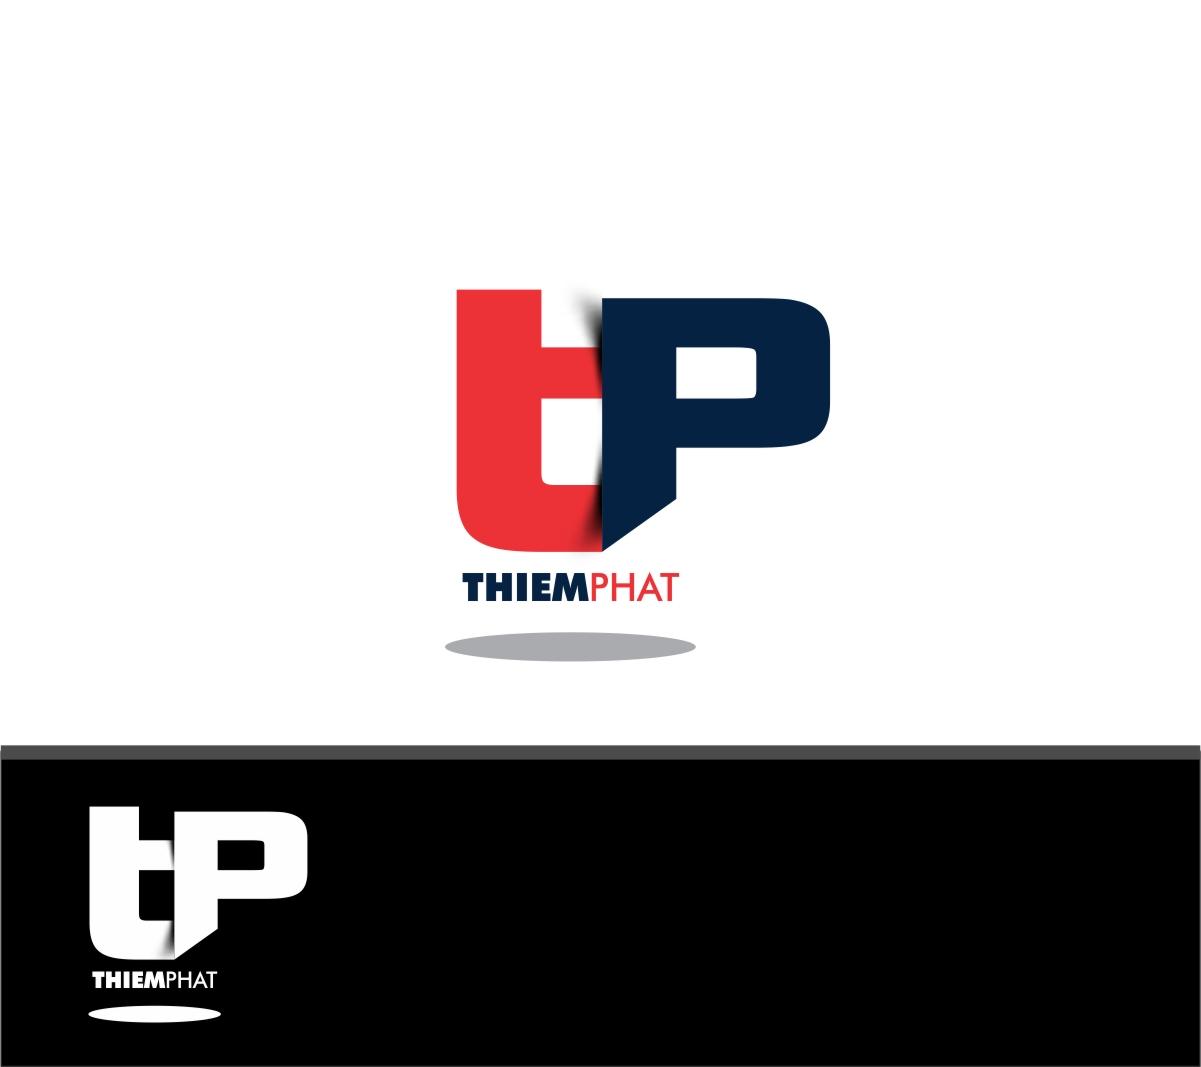 Logo Design by IDESIGNSTUDIO - Entry No. 125 in the Logo Design Contest New Logo Design for Thiem Phat company.